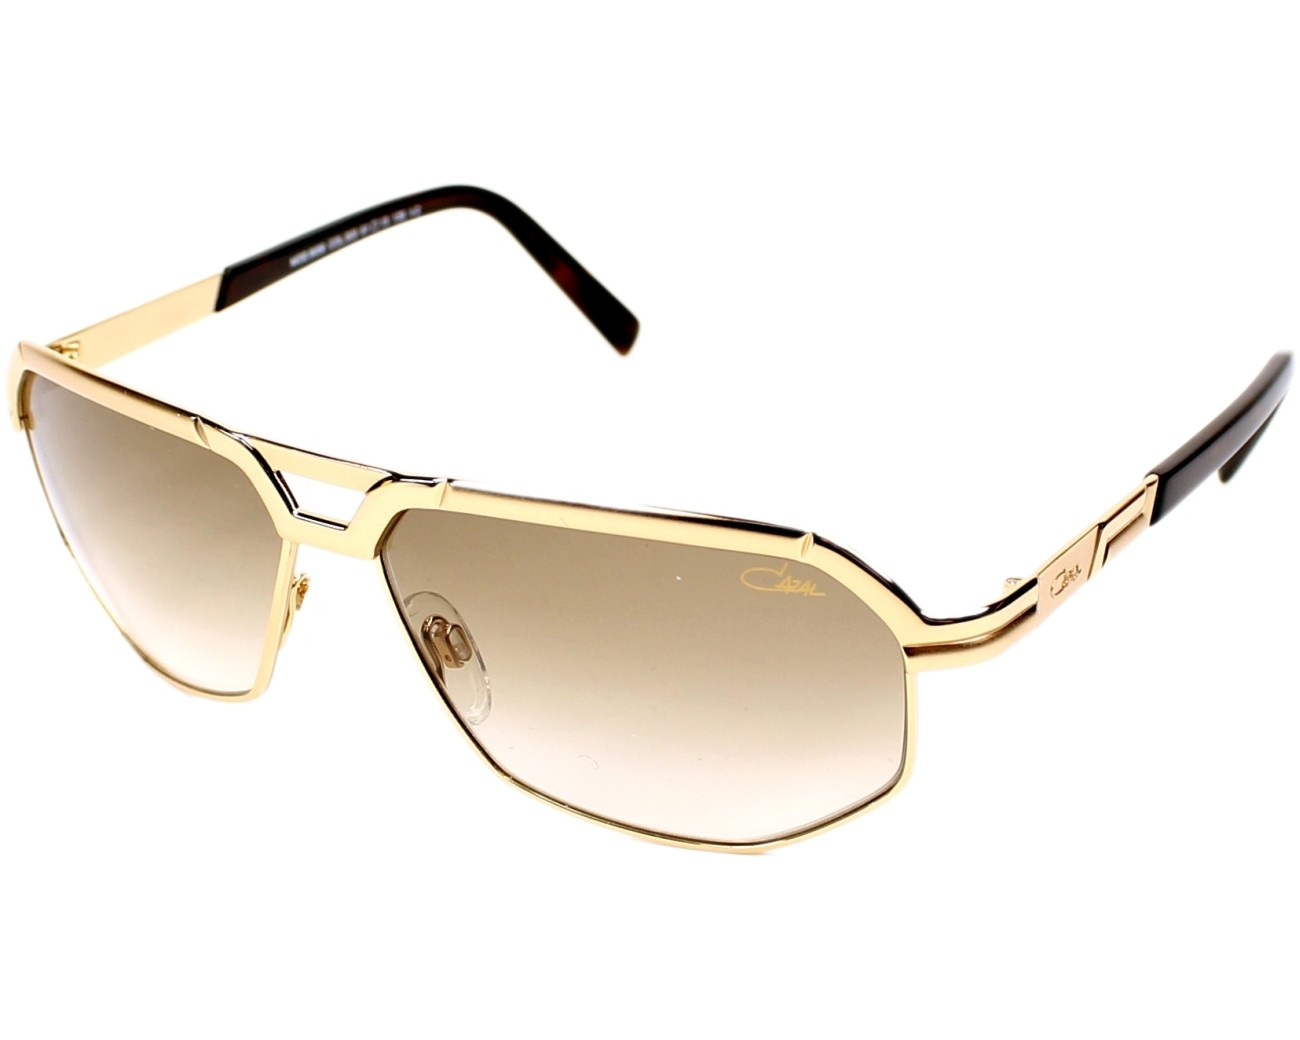 30e9aabe0eb Sunglasses Cazal 9056 003 61-13 Gold profile view